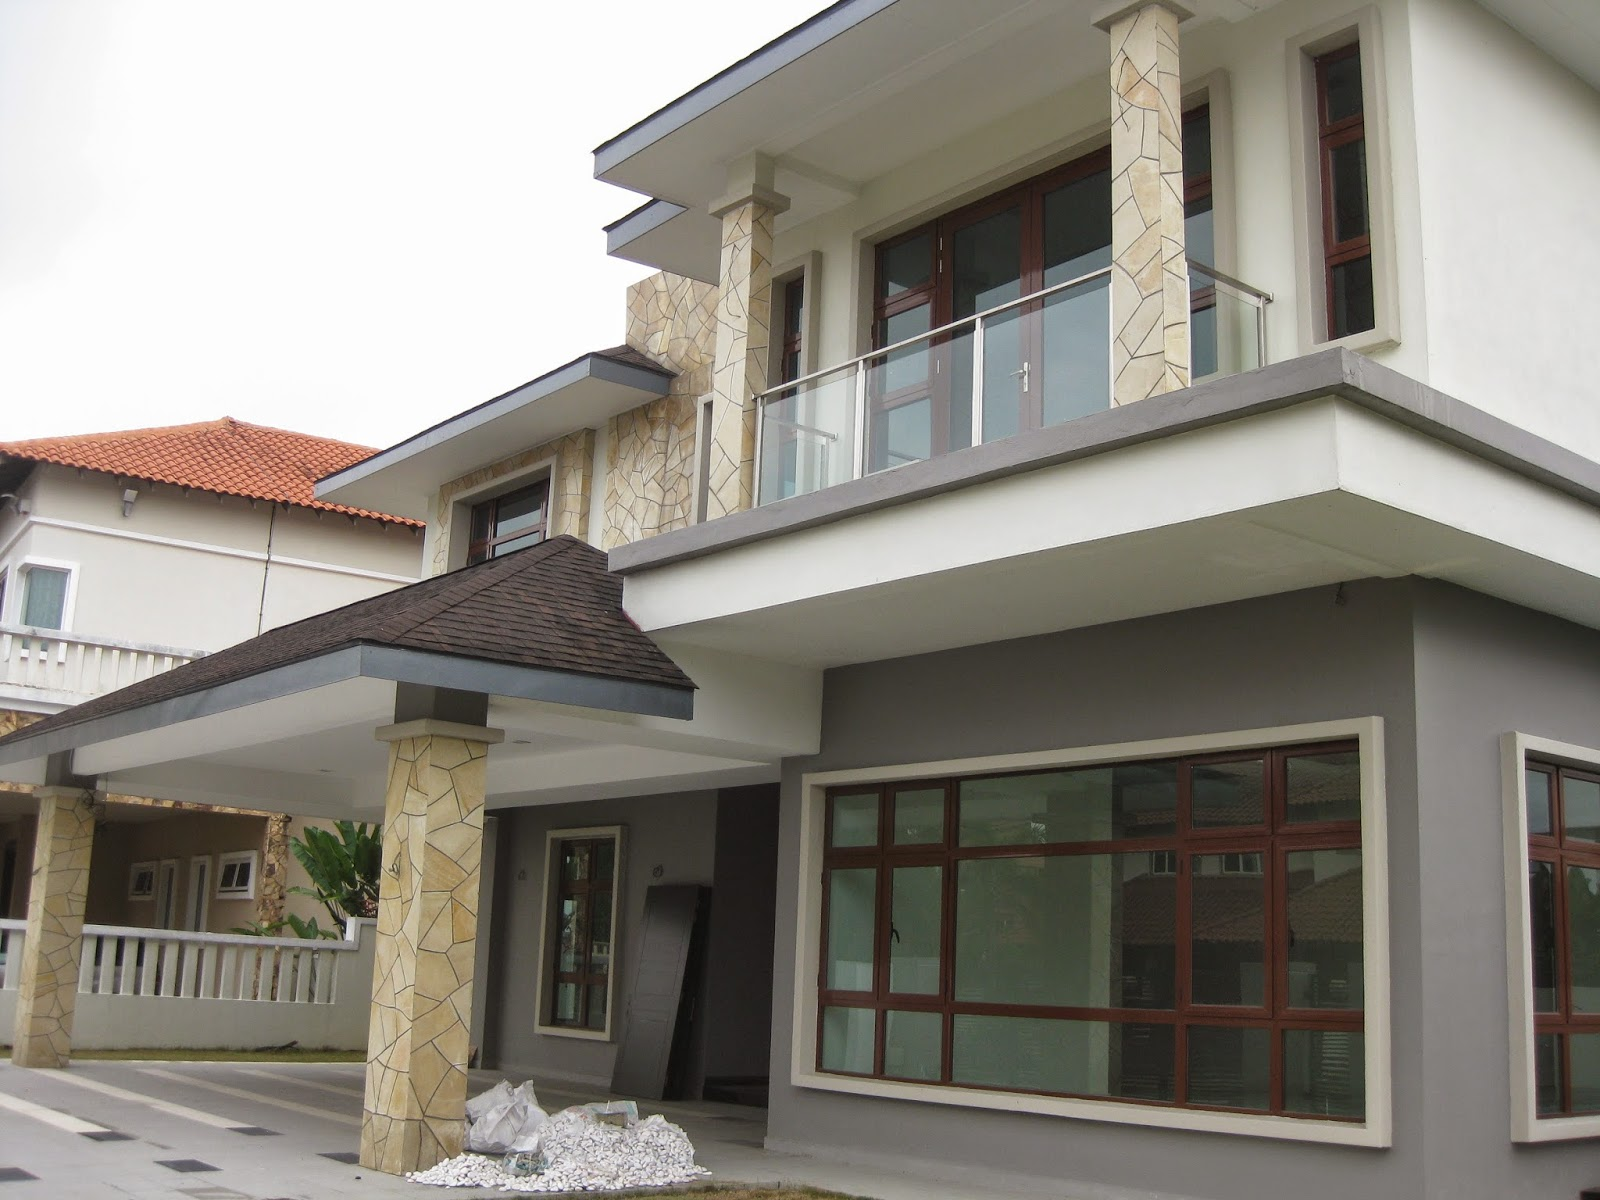 Kota damansara polo club two storey brand new bungalow for Two storey bungalow